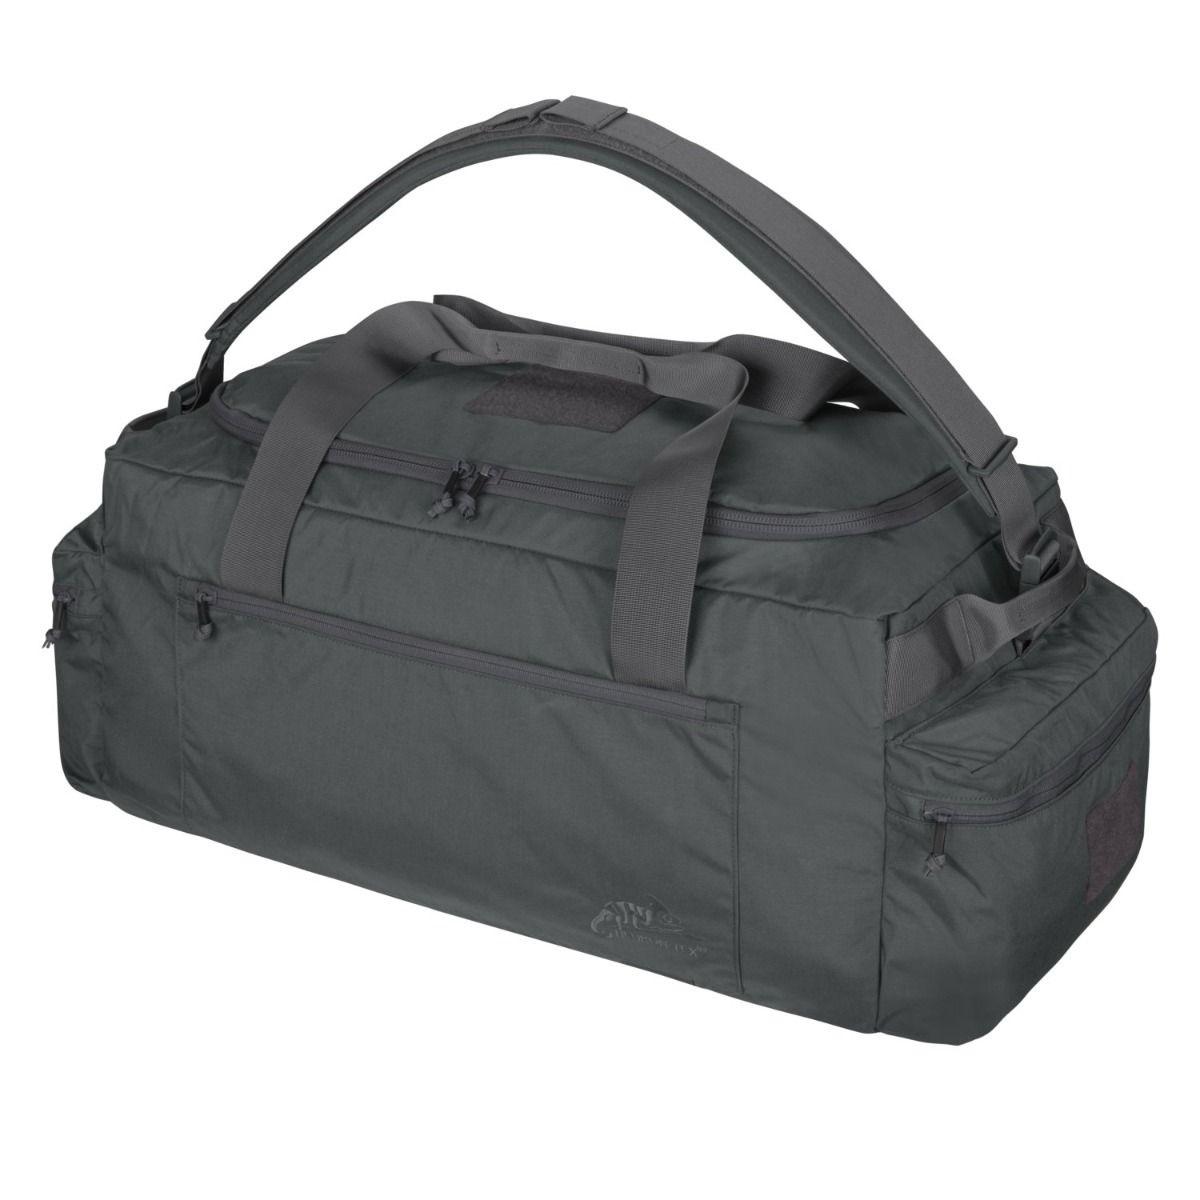 Taška URBAN TRAINING BAG® velká SHADOW GREY - zvìtšit obrázek